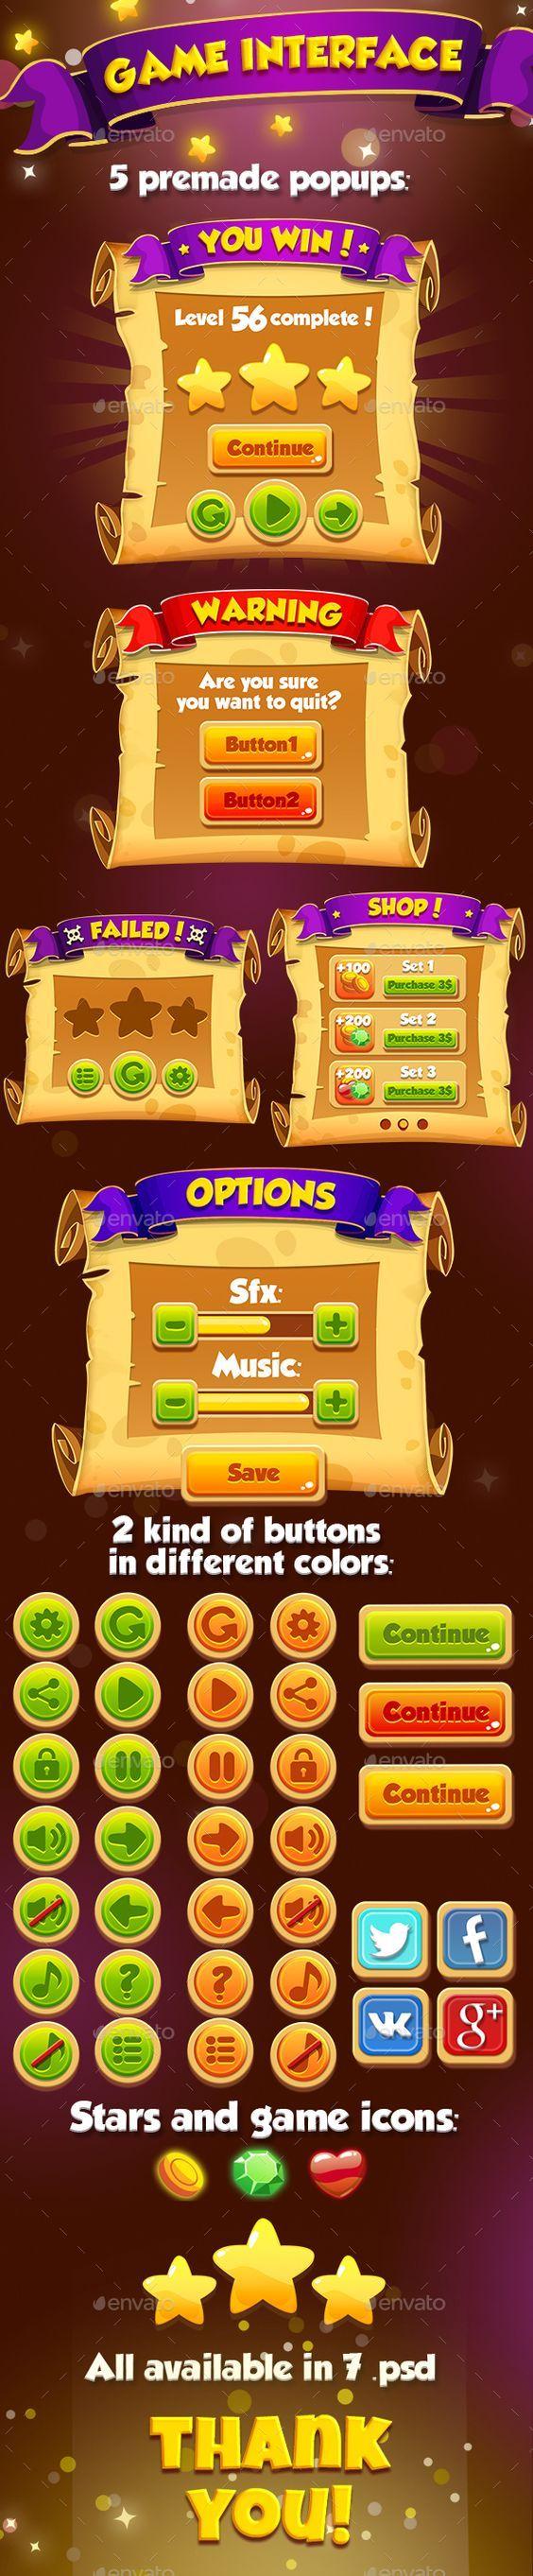 Cartoon Manuscript Game UI Kit! (User Interfaces):